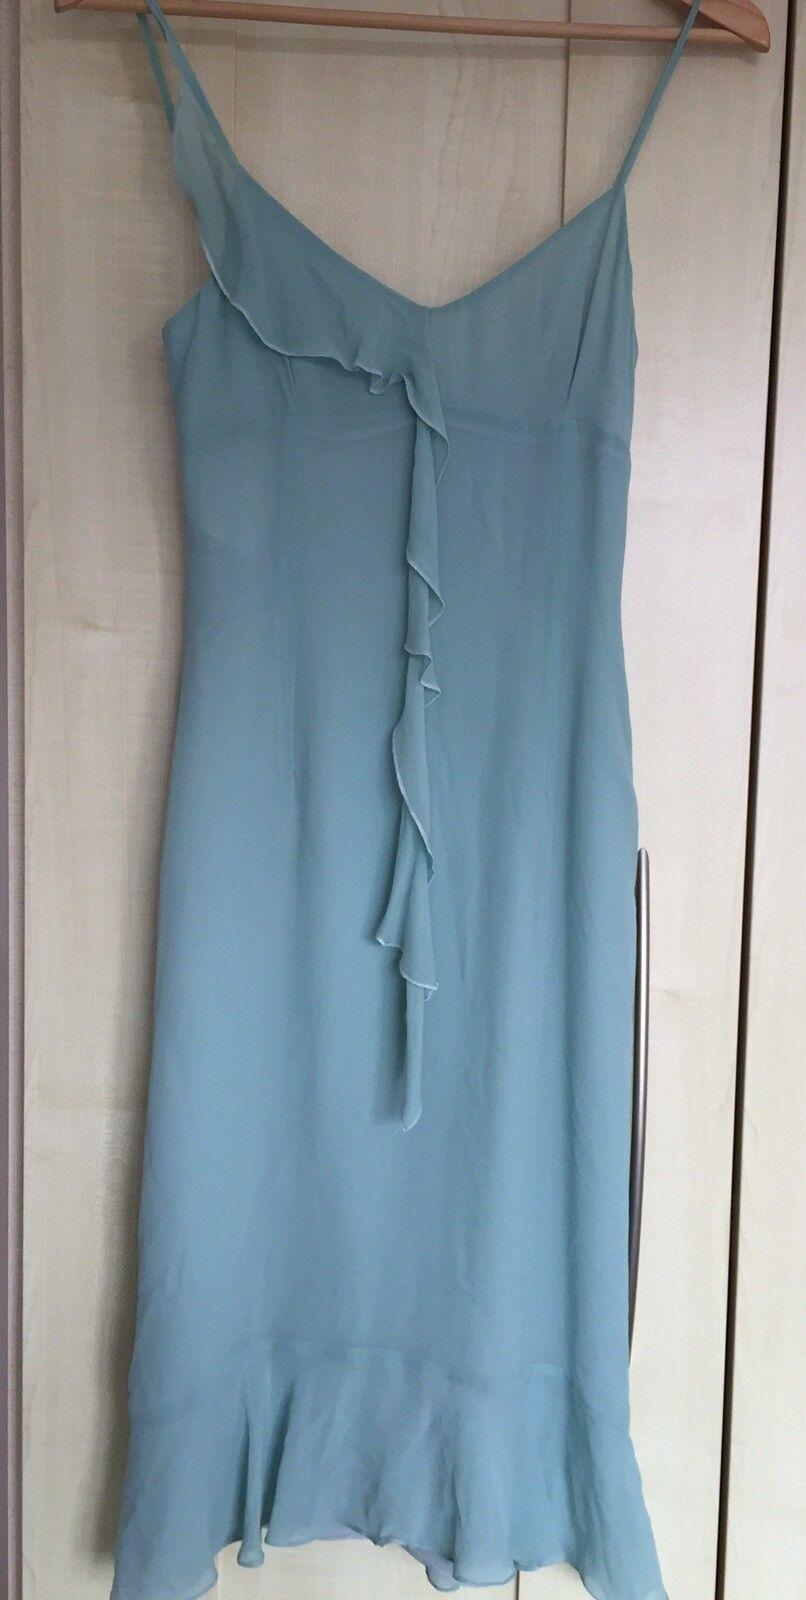 Beautiful aqua, size 8 dress by Karen Millen